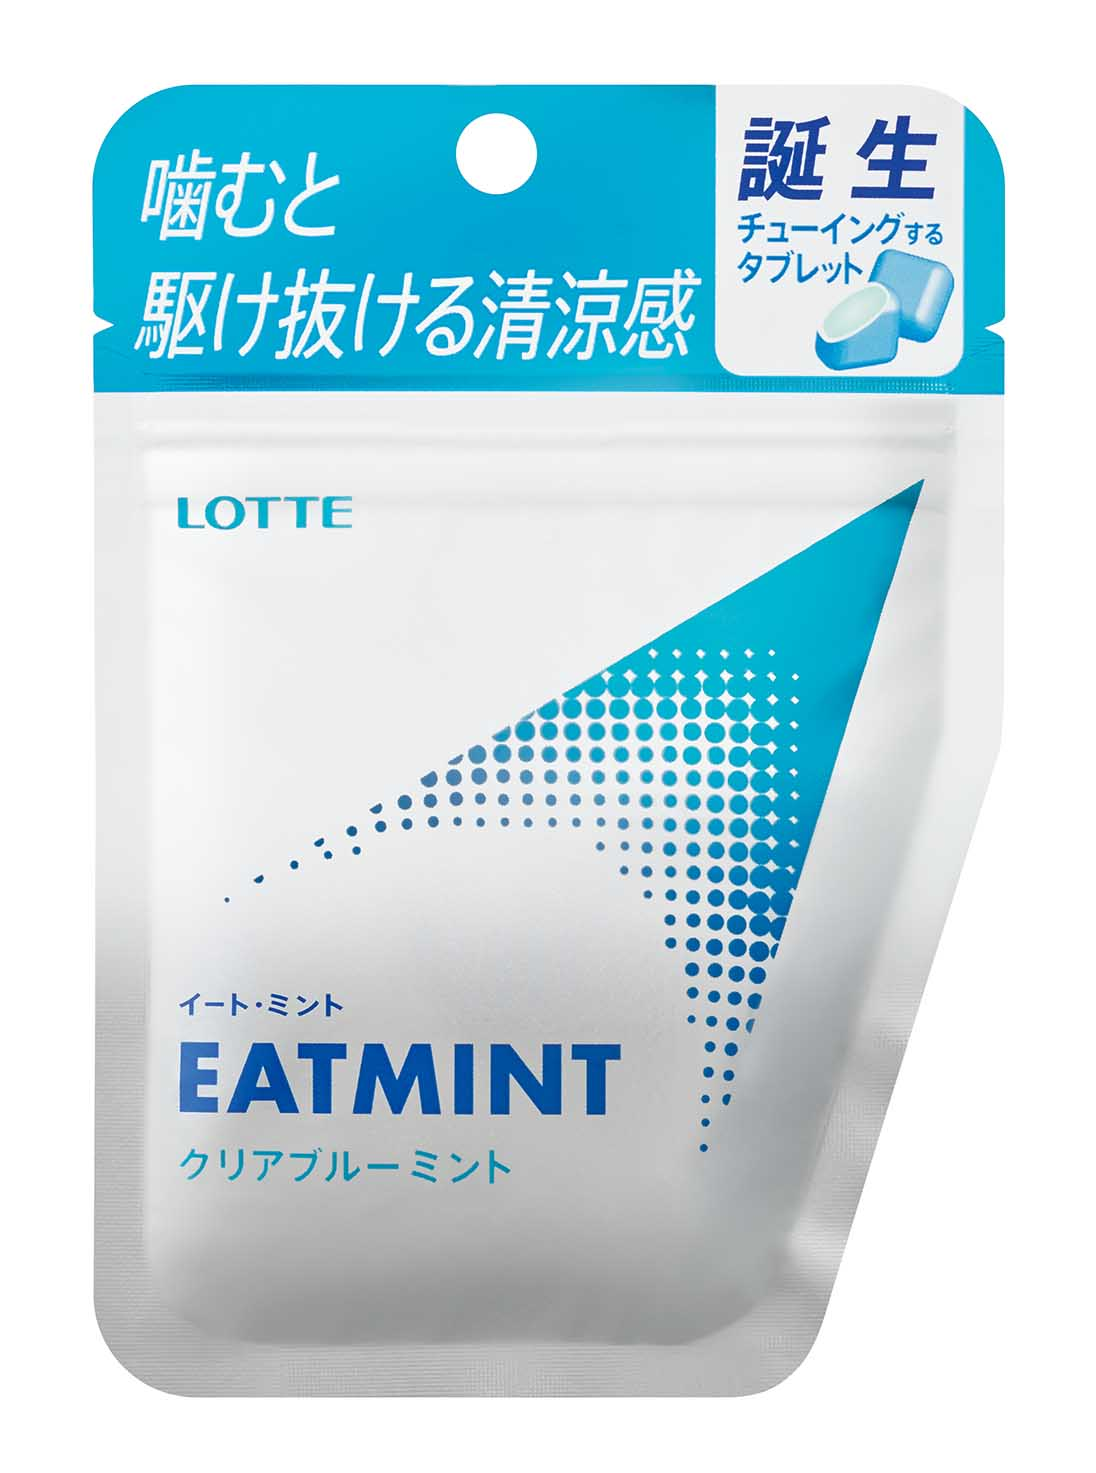 %e7%ab%b9%e5%86%85%e6%b6%bc%e7%9c%9f-ryoma-takeuchi_6-2